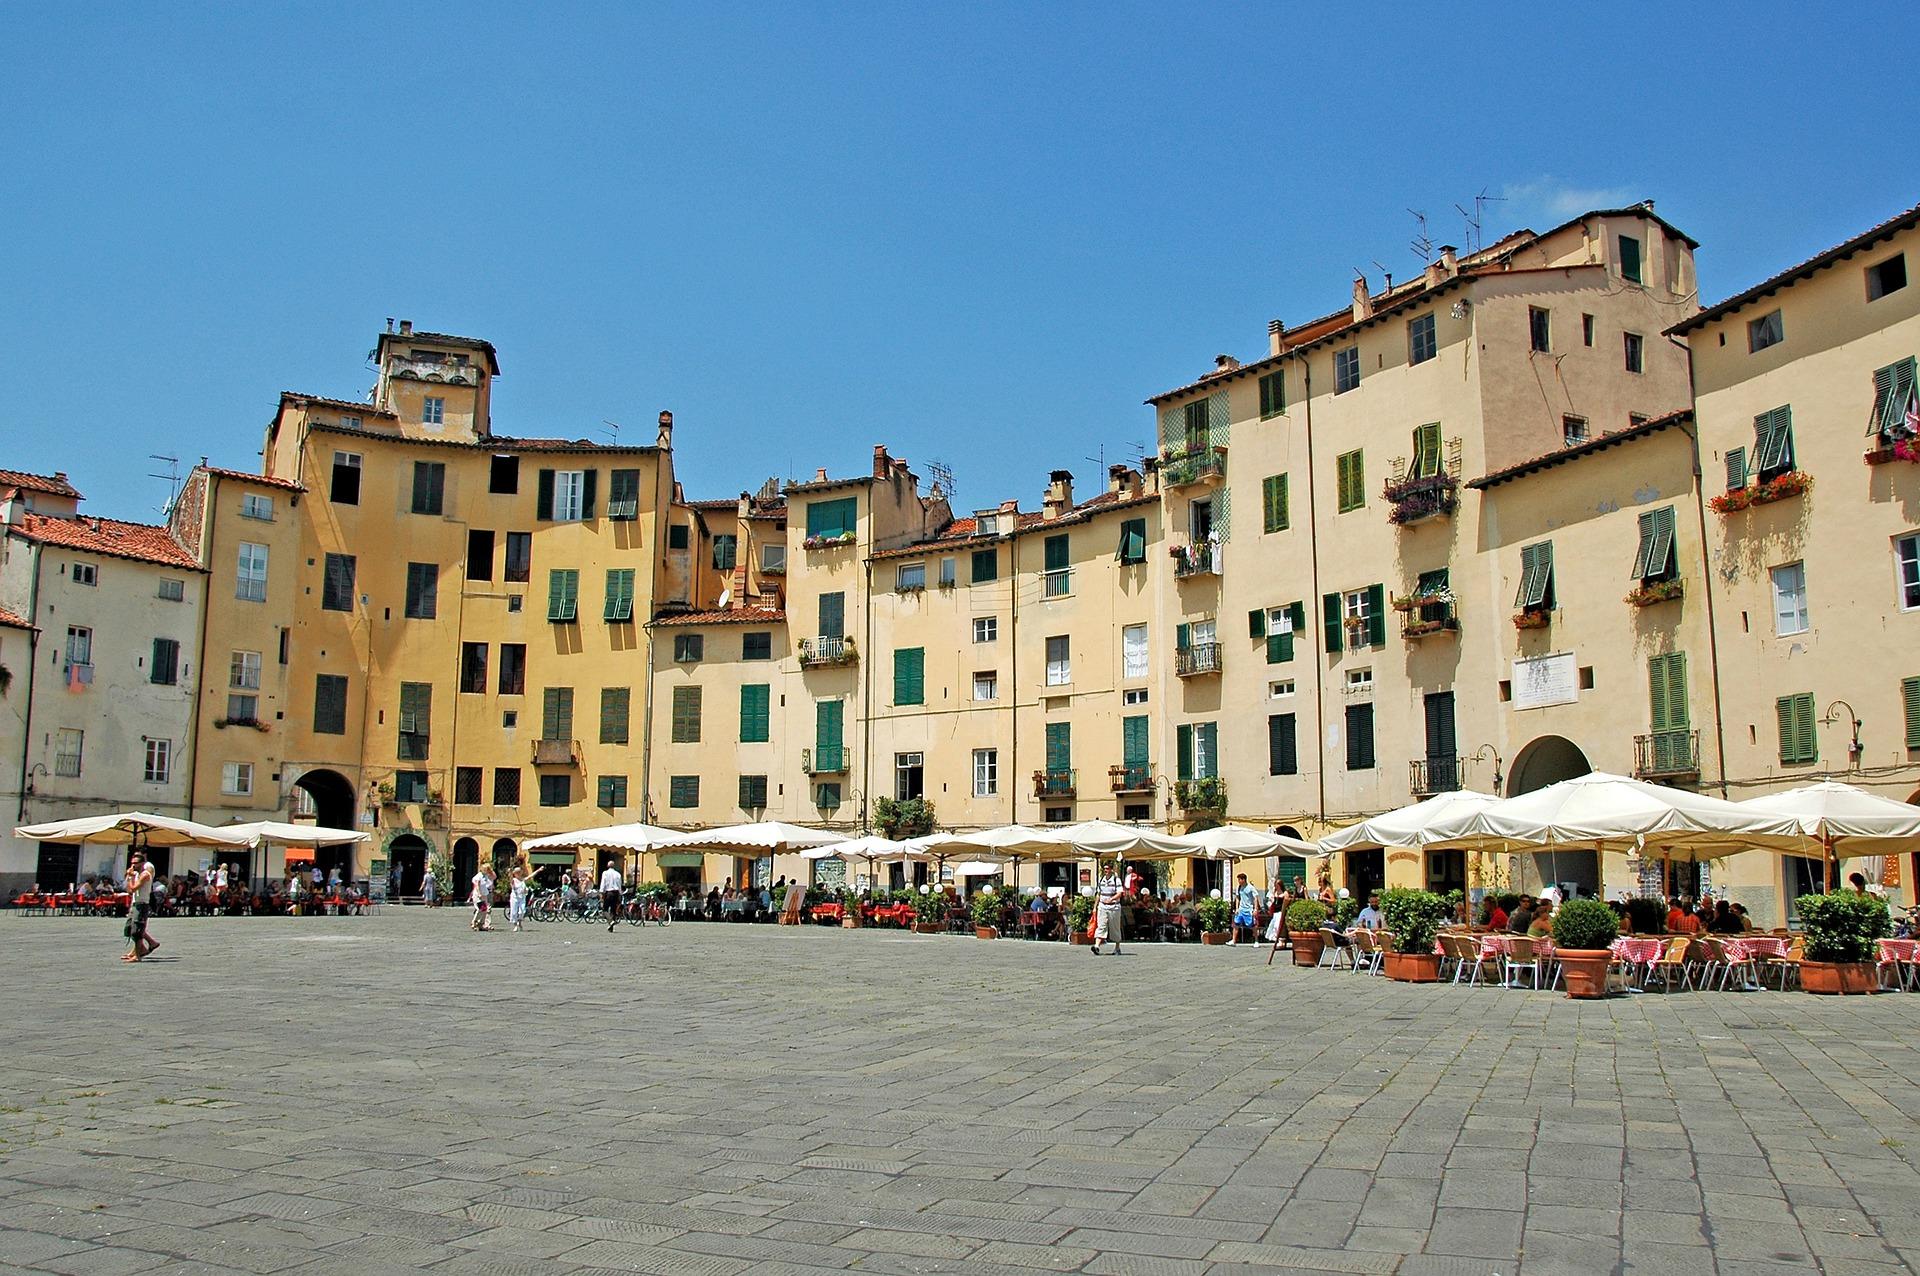 Visiter Lucca